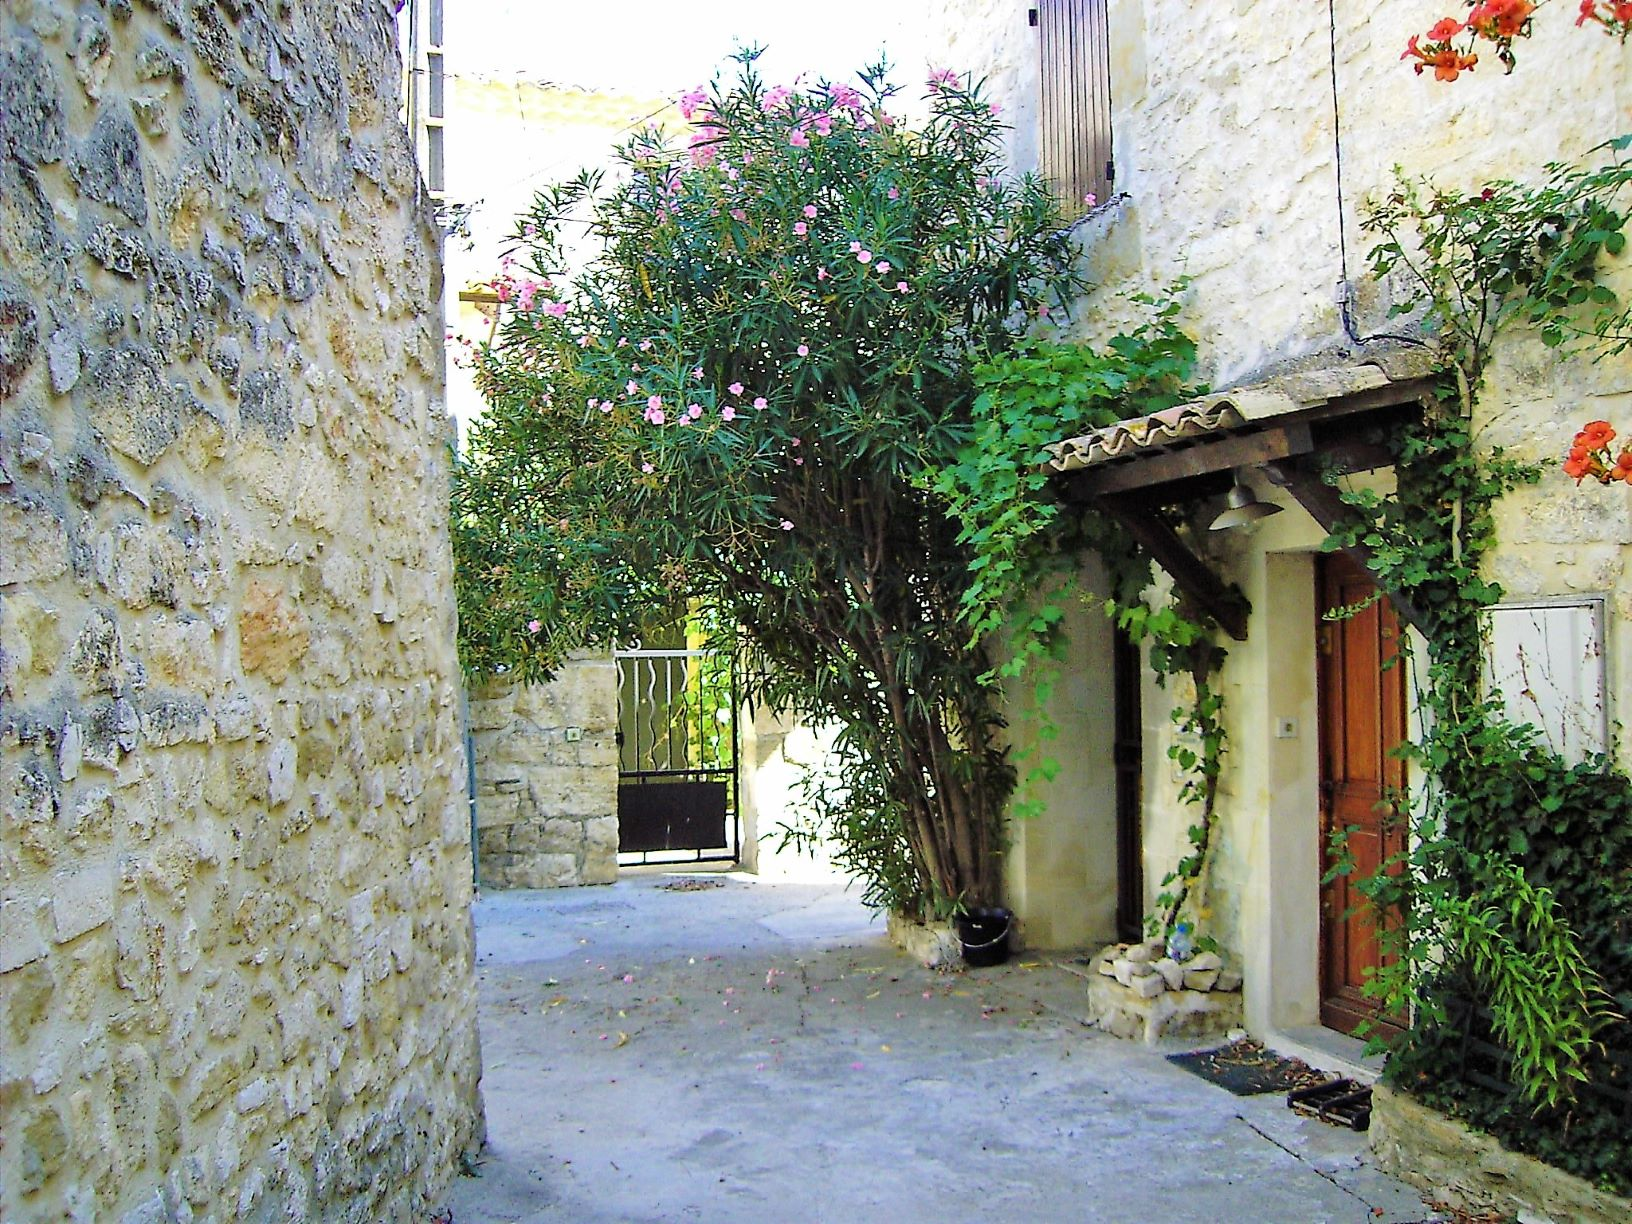 Sommer am Pont du Gard – Kapitel 12